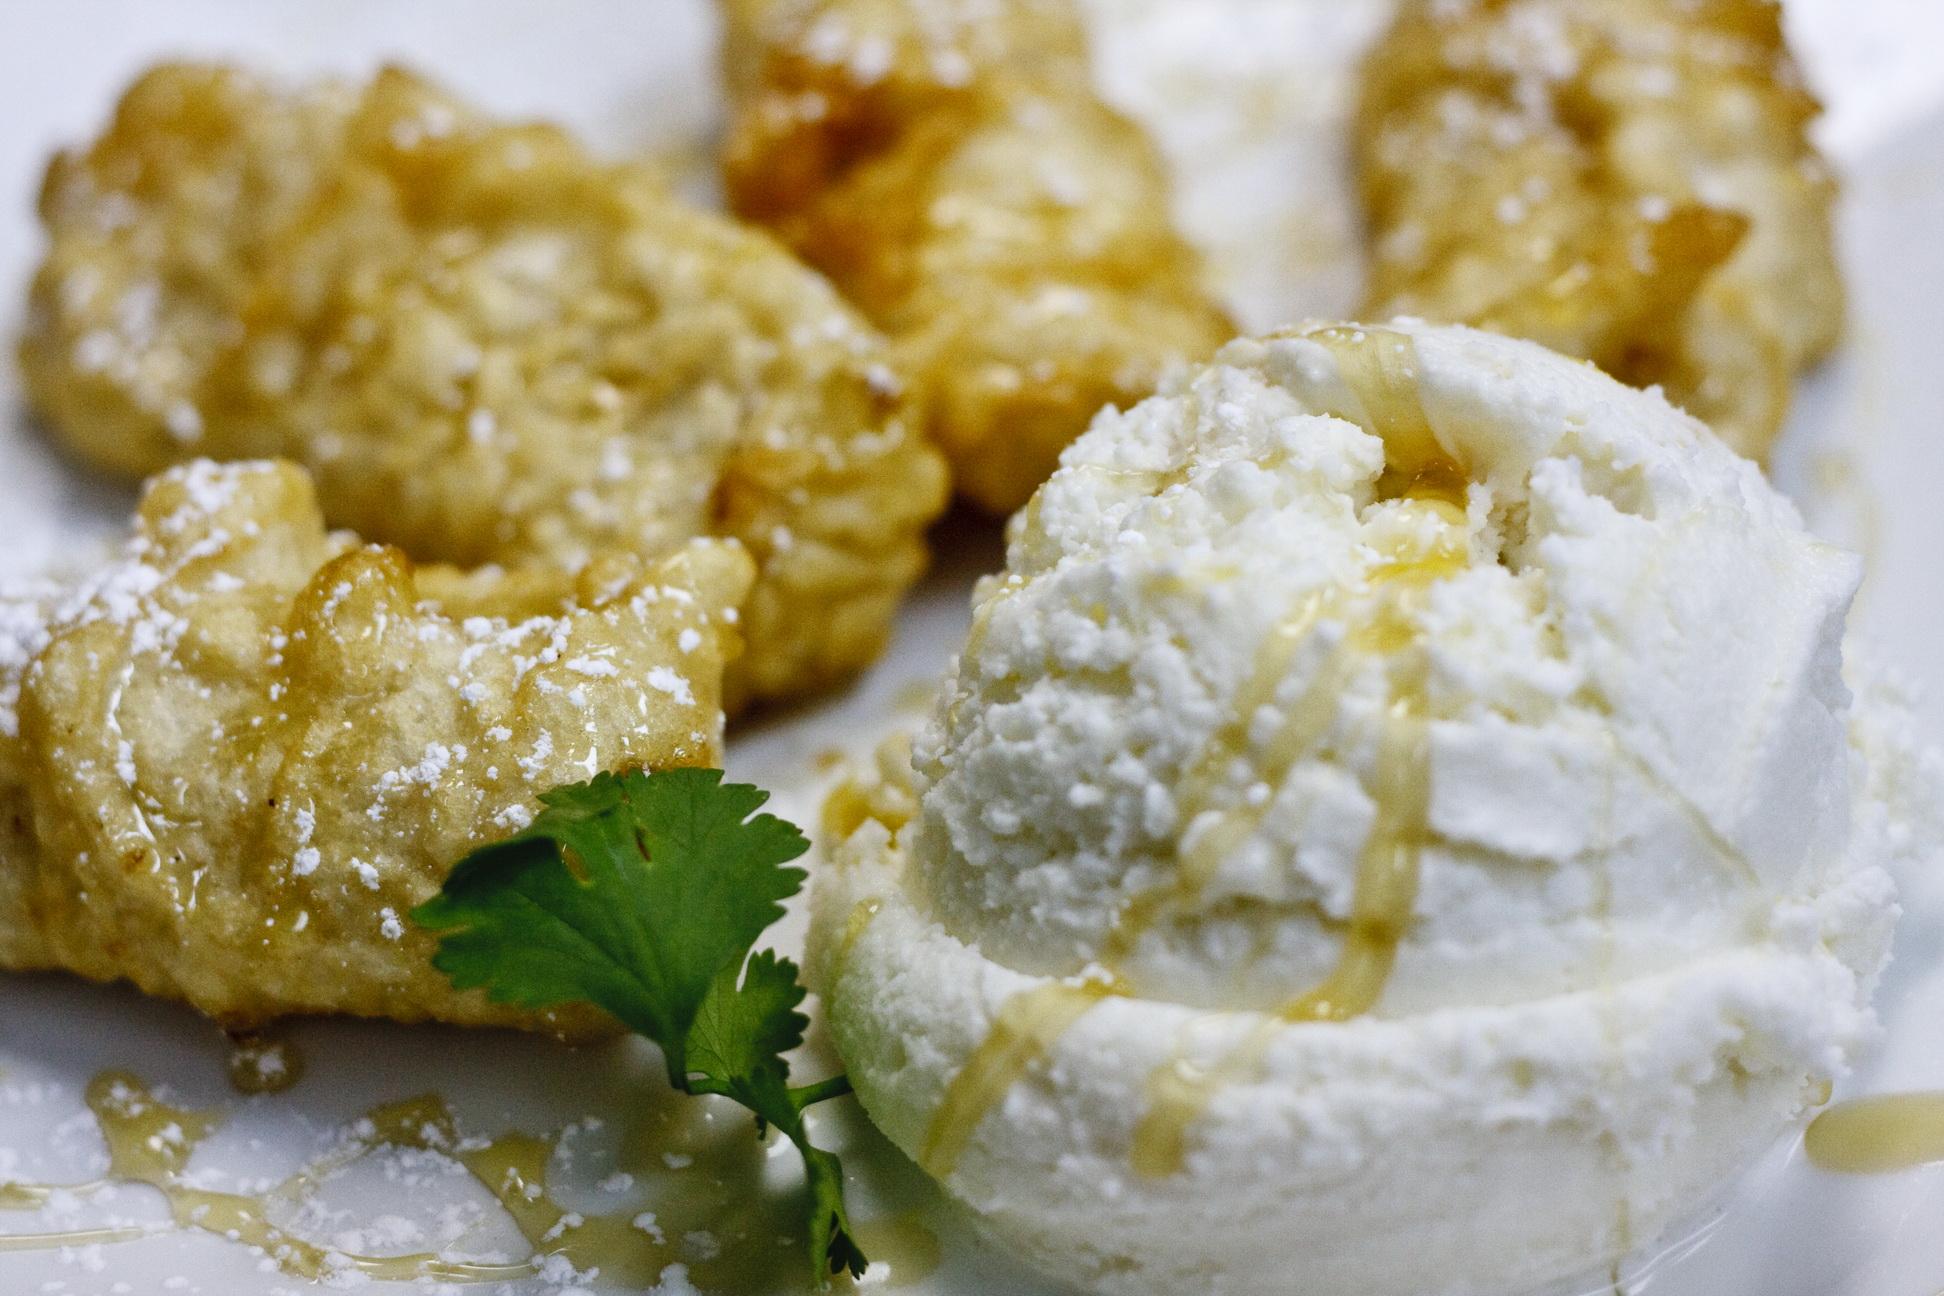 (59) Fried Banana with Coconut Ice Cream Image